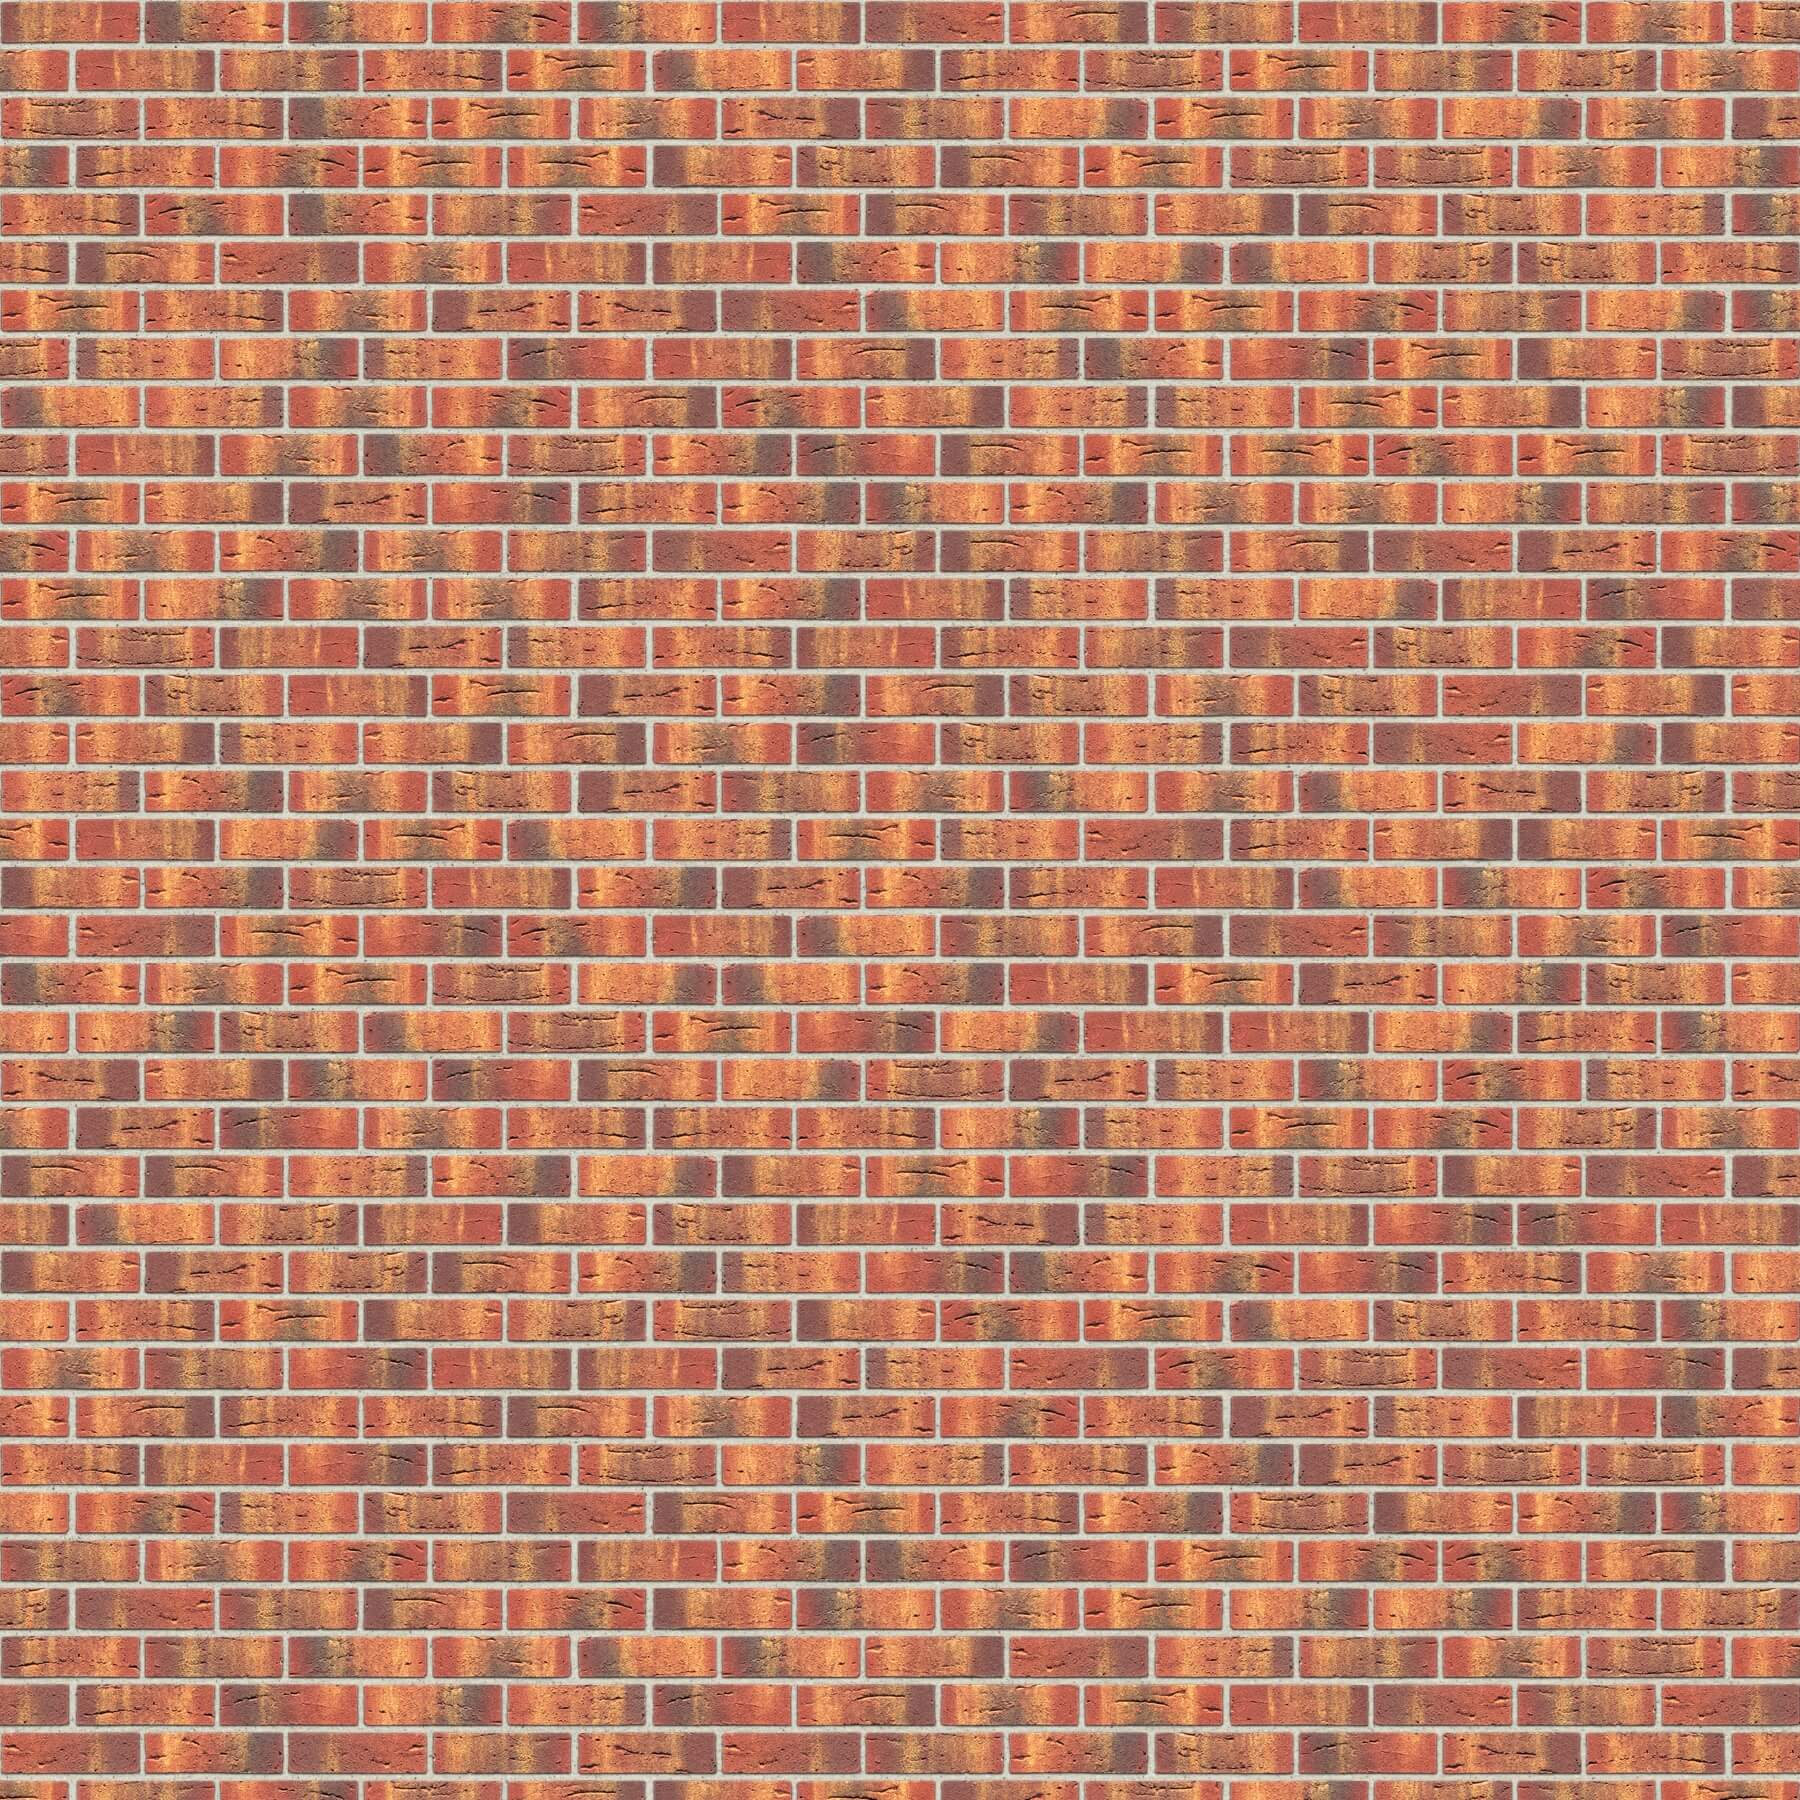 Puna-cigla-Feldhaus-Klinker-brick-house-nf-k-328-Bela Fuga